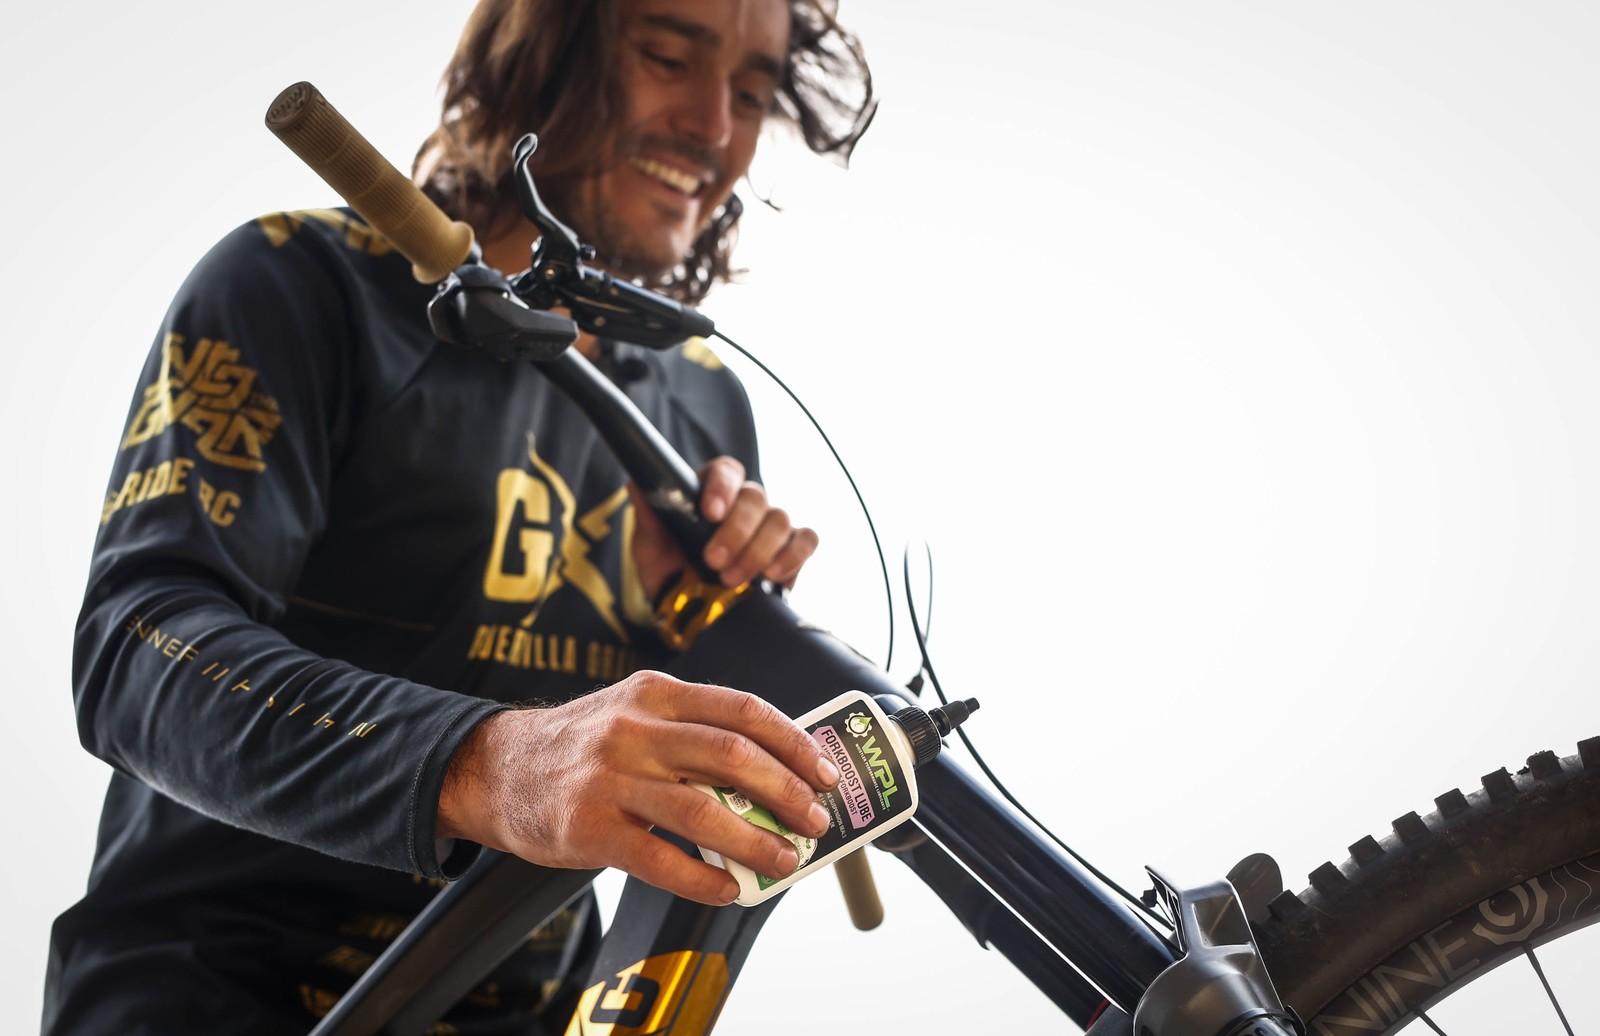 Yoann Barelli - The Sustainability Guru Just Got Greener